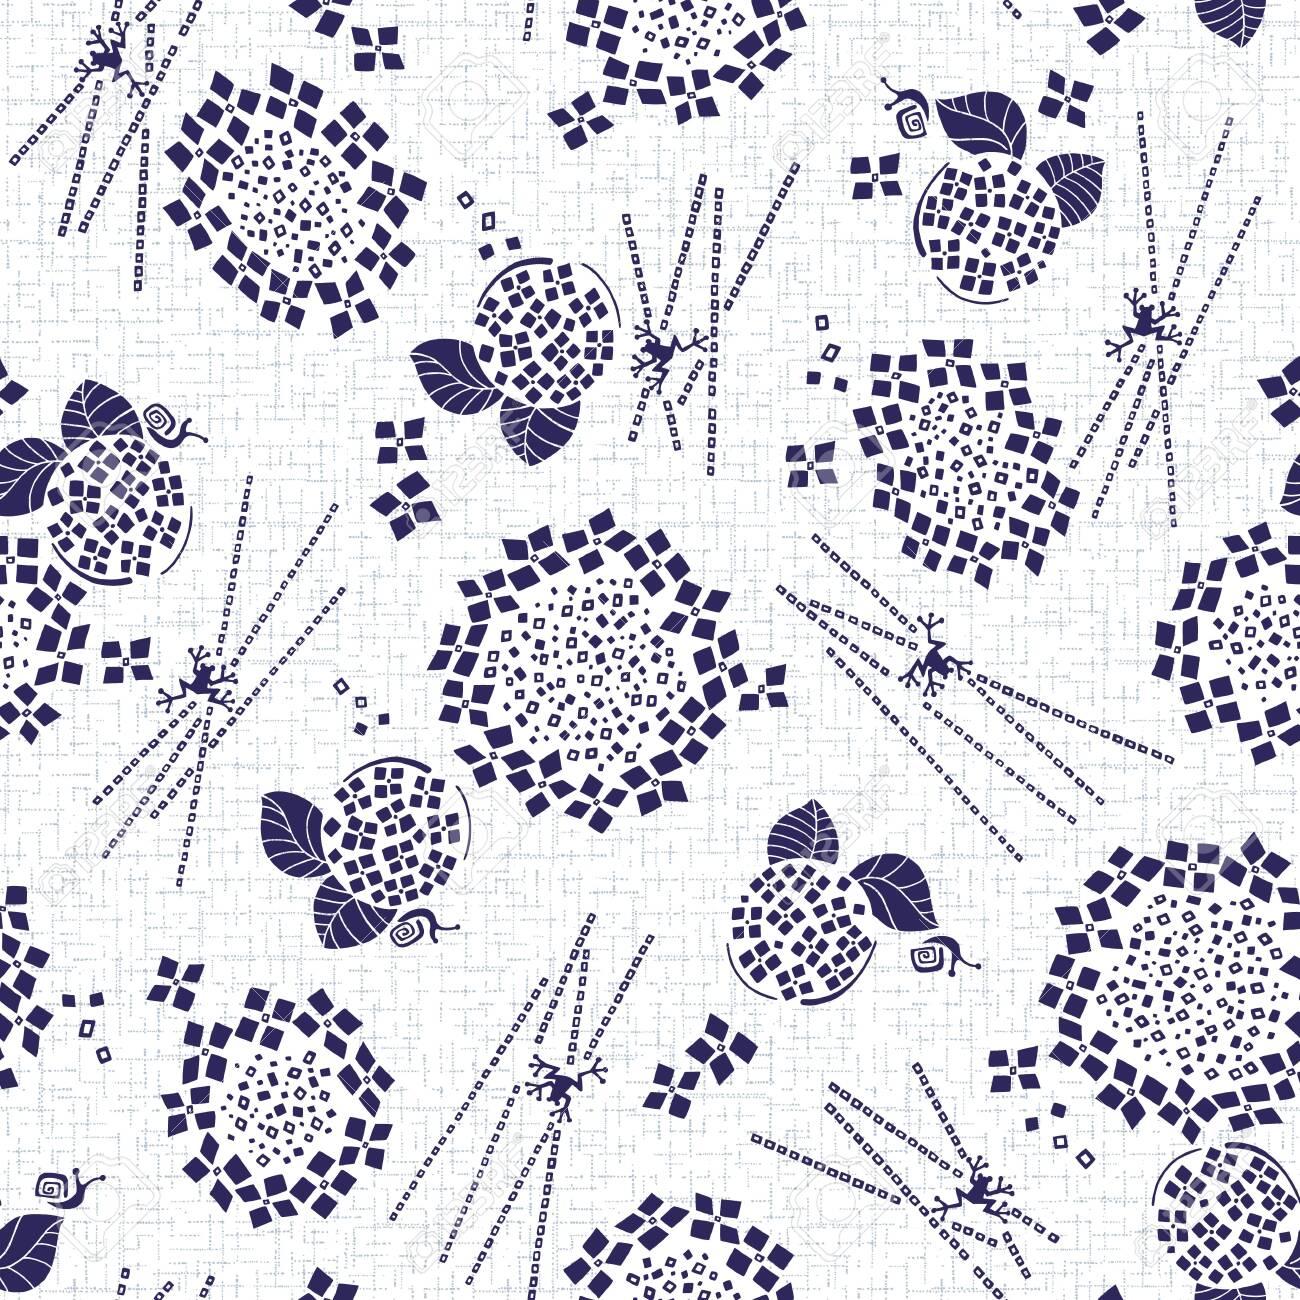 Abstract Japanese style hydrangea pattern, - 134257516